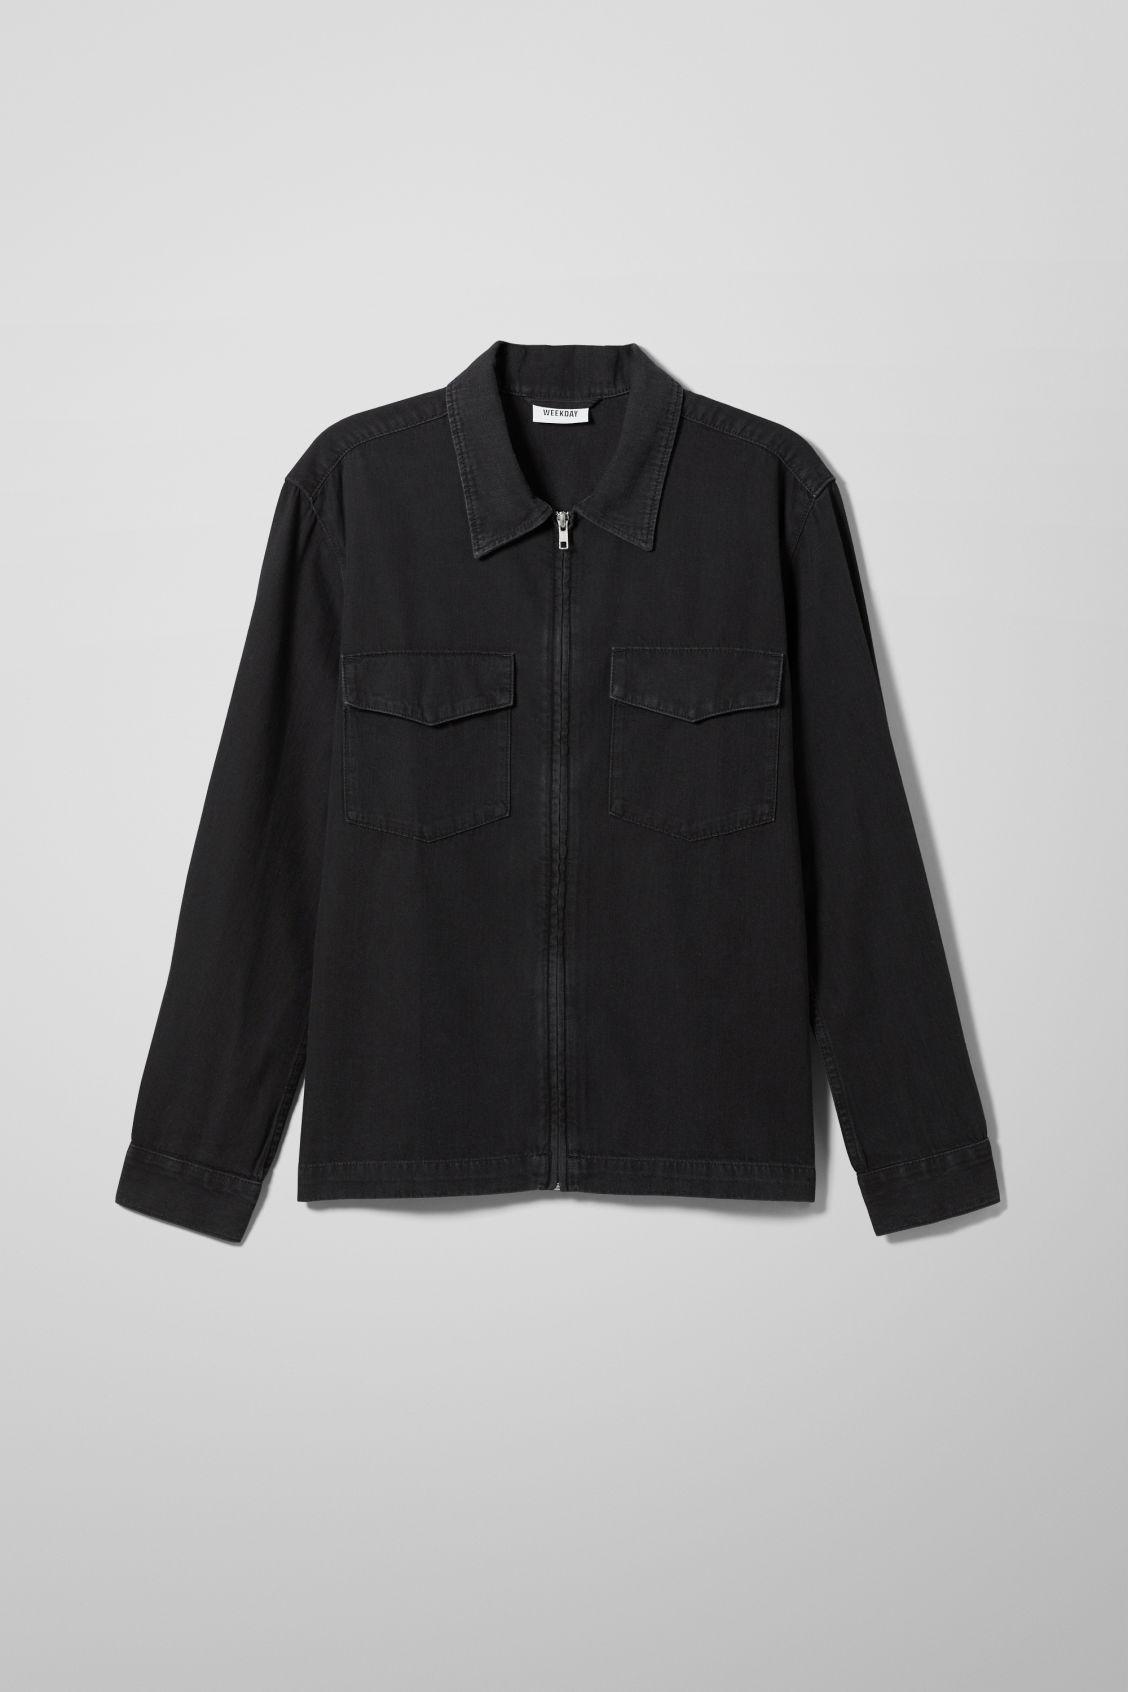 Eden Zip Washed Black Denim Shirt - Black